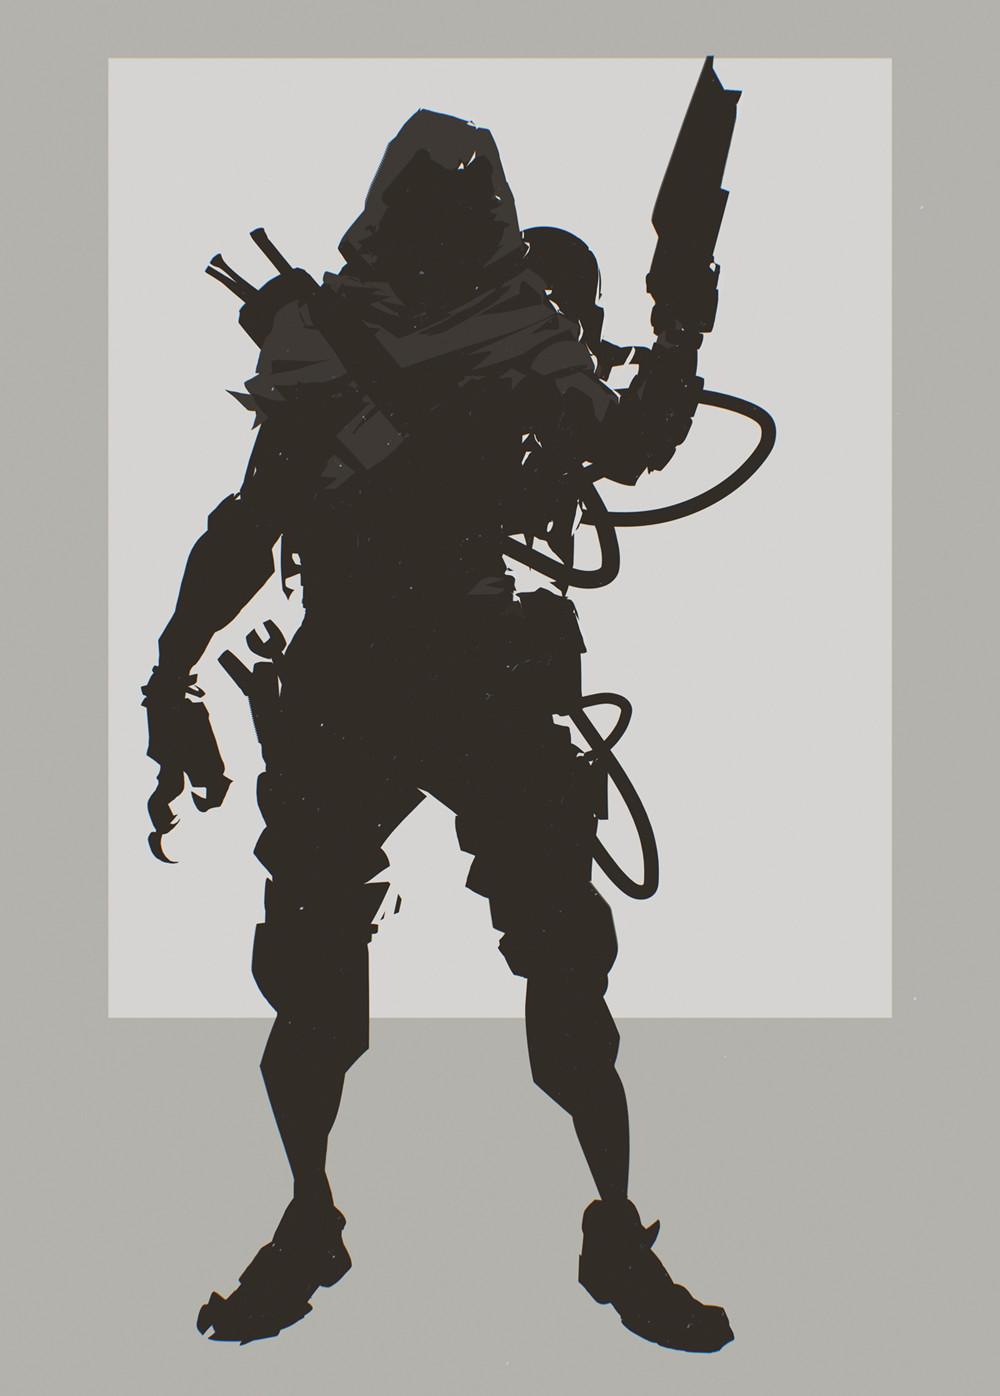 Scott flanders evolve kala silhouette